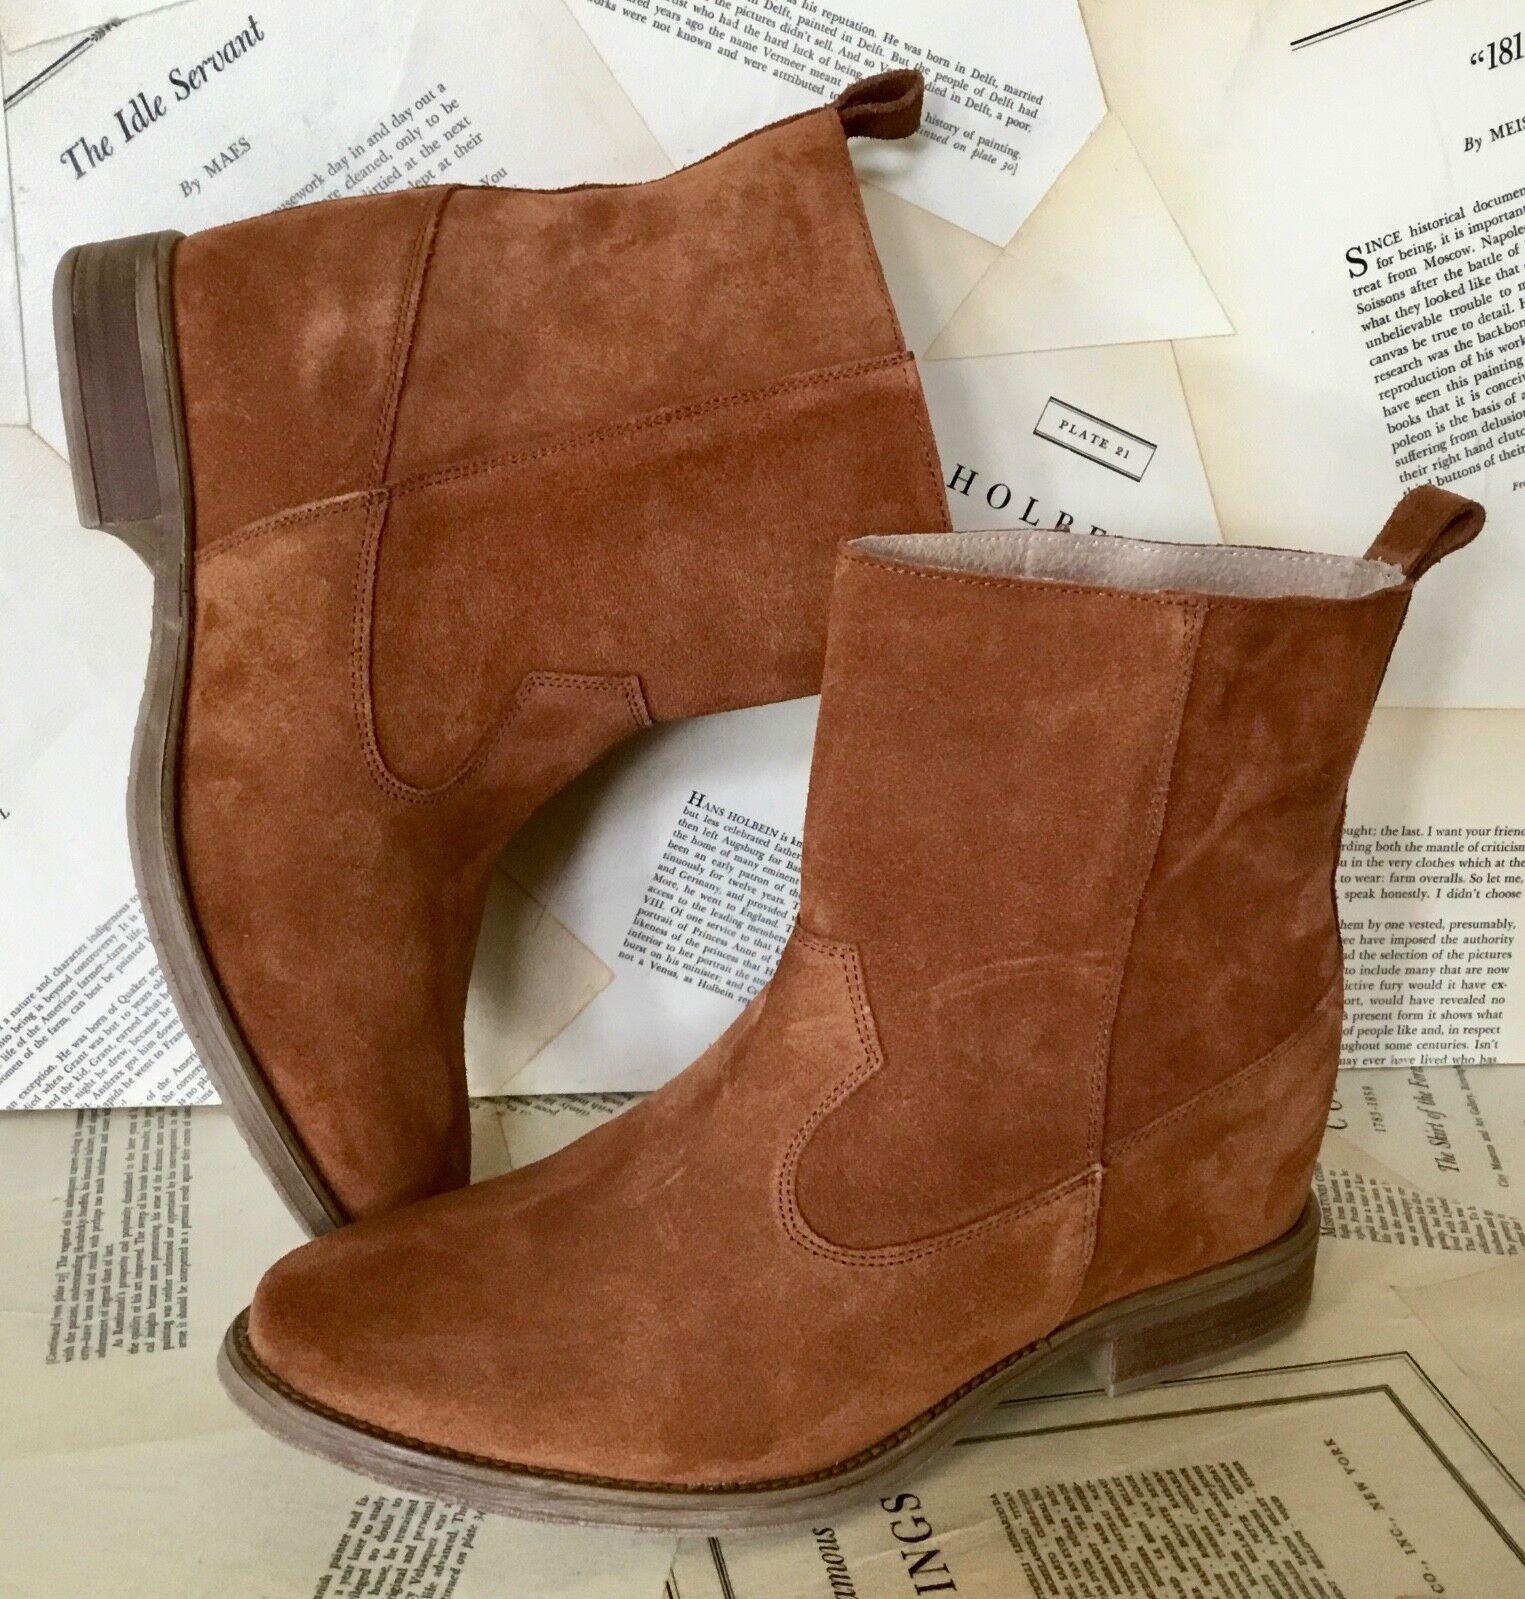 Nuevo anthropologie Gamuza Marrón Tirar moldeada moldeada moldeada suela botas al tobillo Botines 38 7.5-8 0491ea